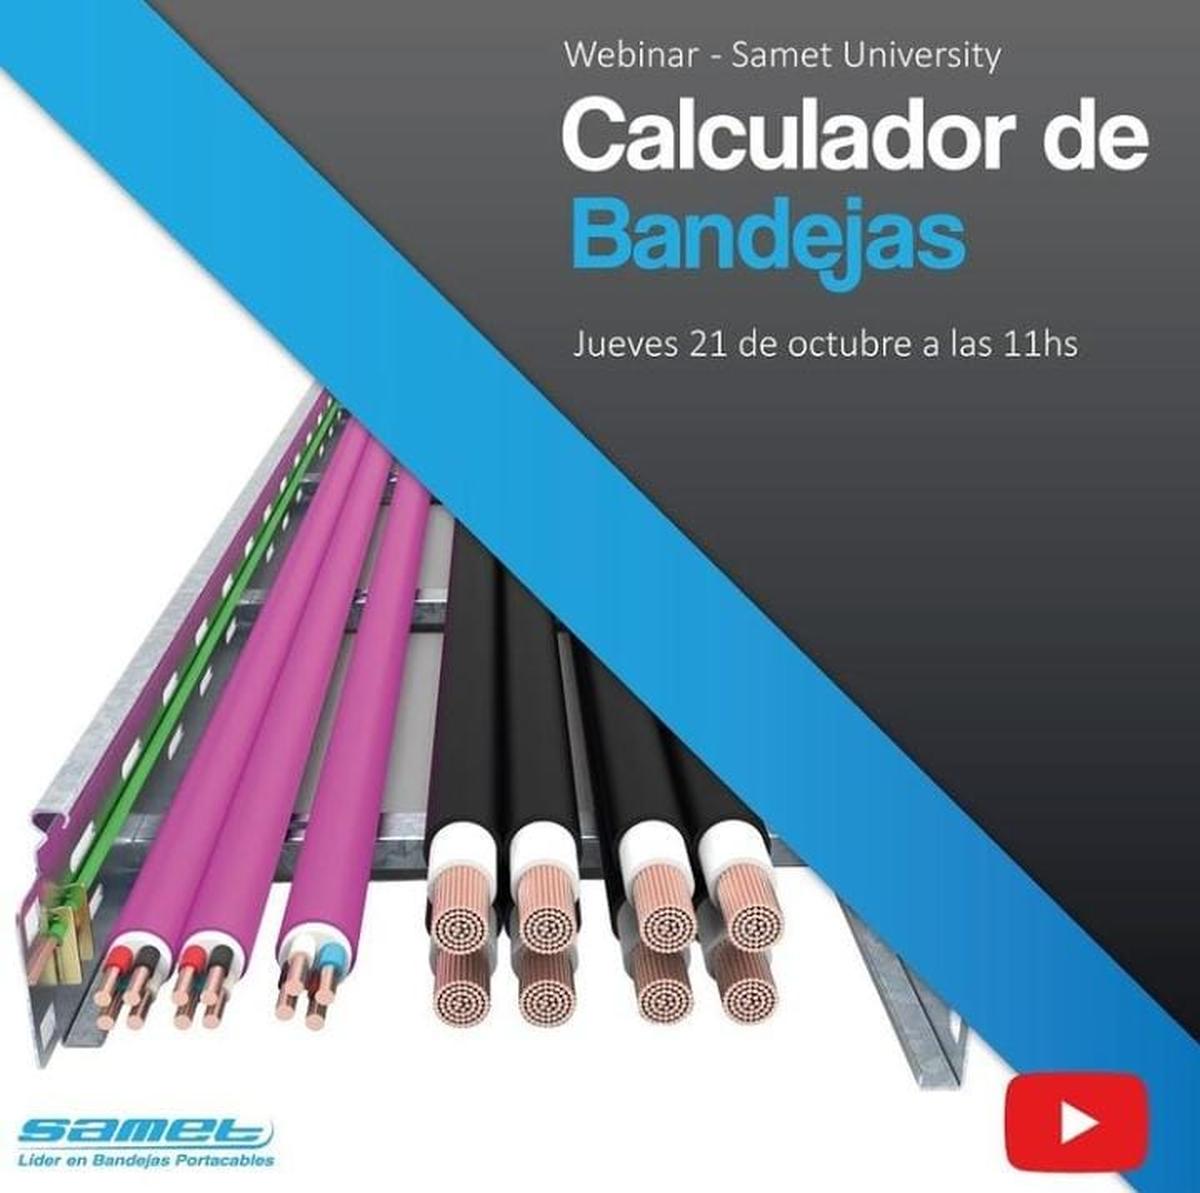 Curso sobre el Calculador de Bandejas Portacables de Samet